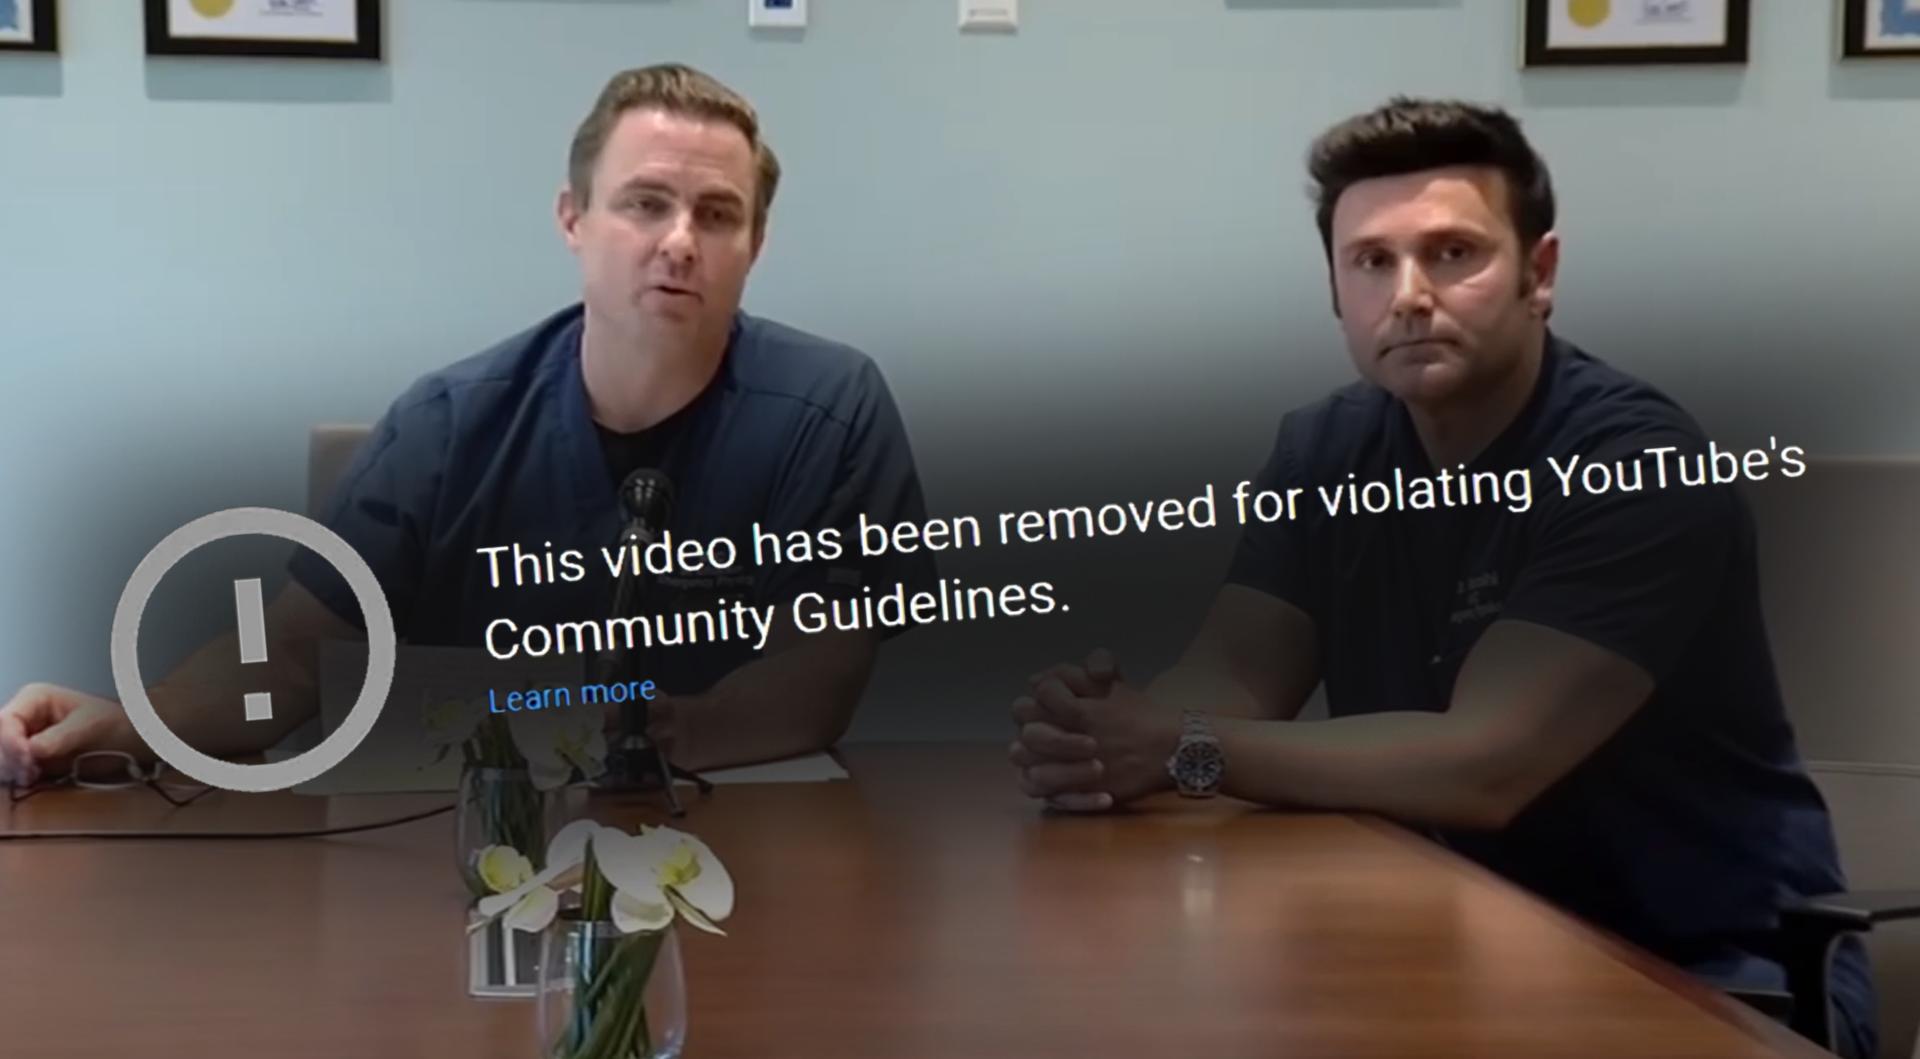 Bitcoin.com's Mining Video Censored: The Tale of Youtube's Blatant Censorship and Propaganda